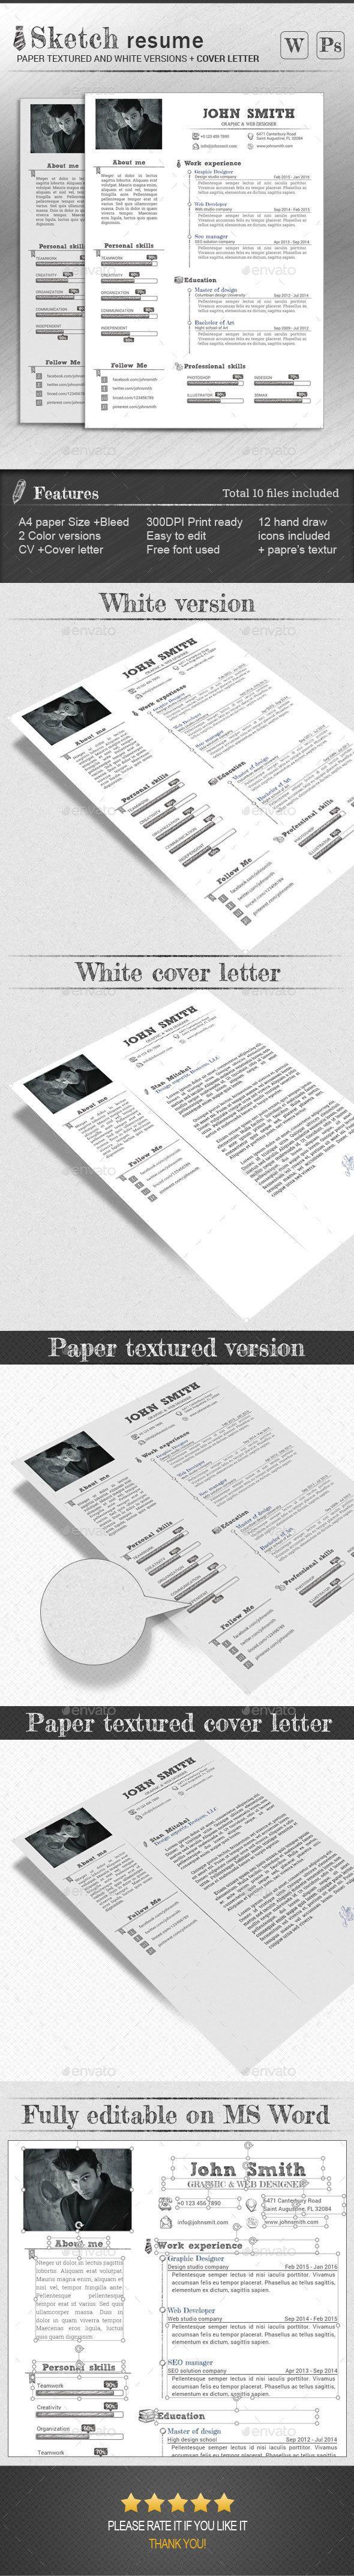 Resume Template PSD design resume template Download